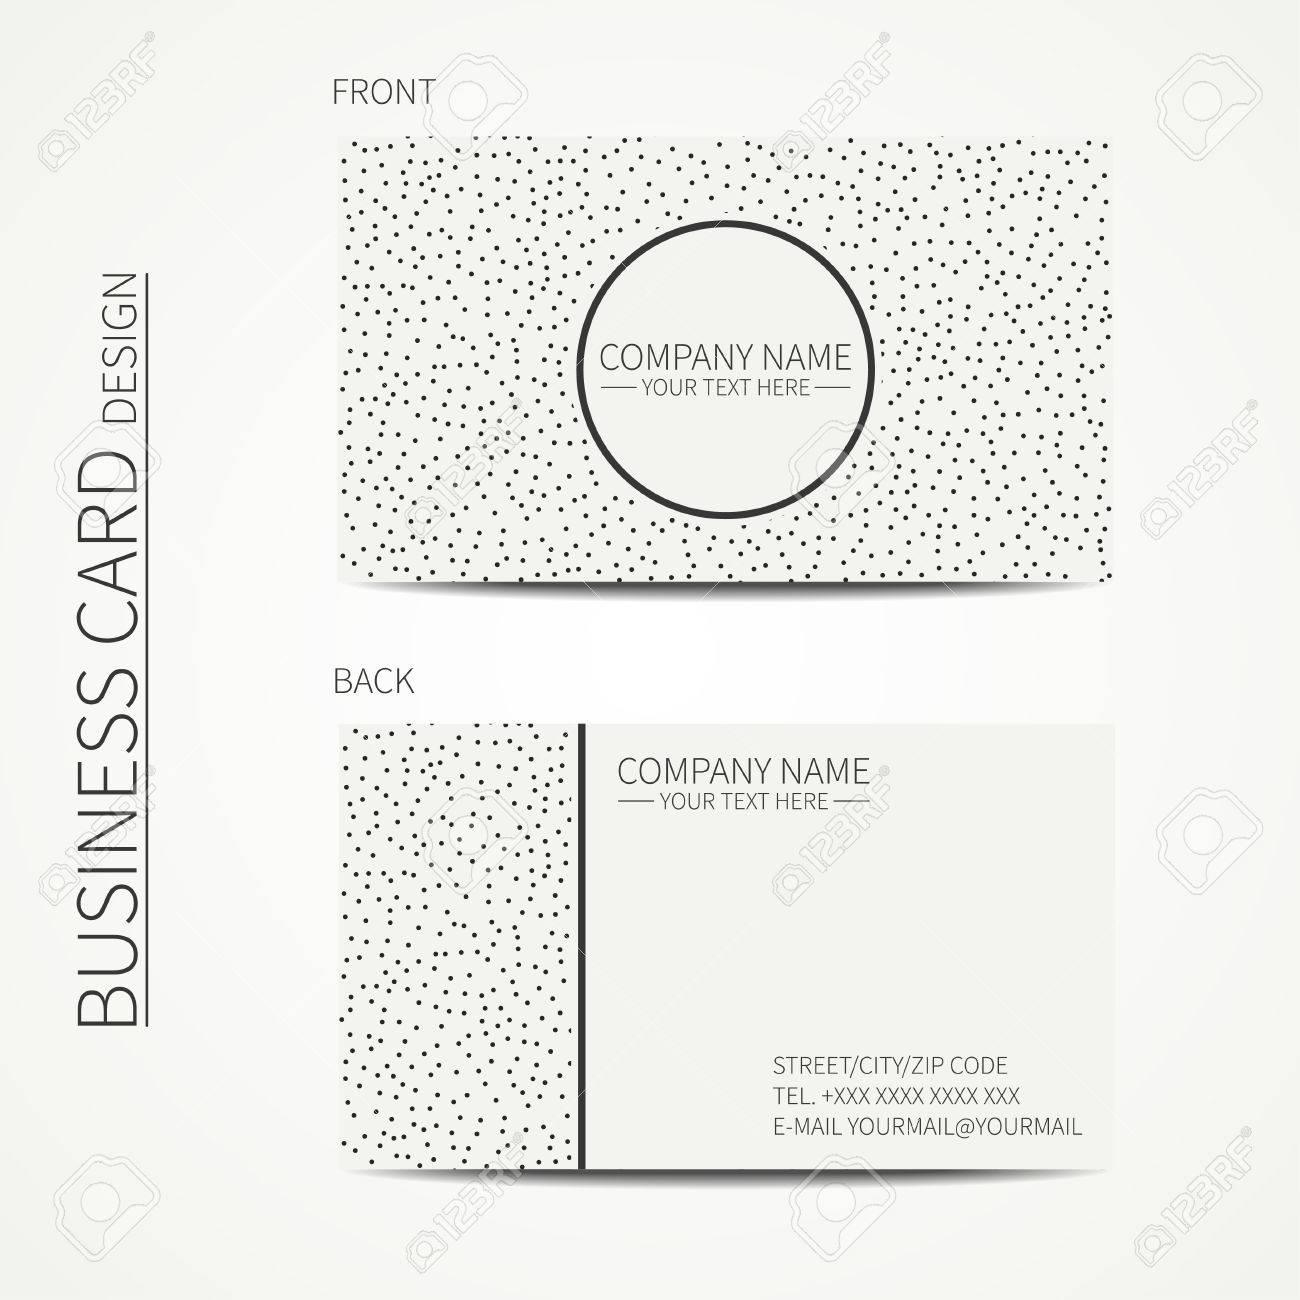 Vector Simple Business Card Design Template Black And White - Simple business card design template